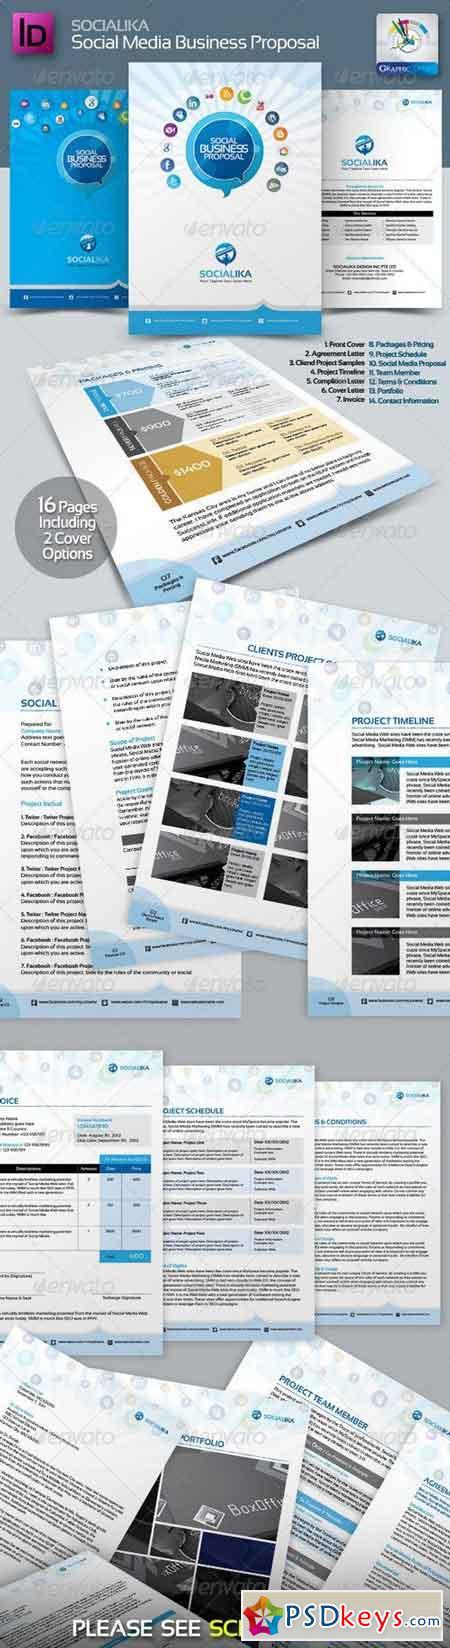 Socialika Social Media Business Proposal 2687391 Free Download